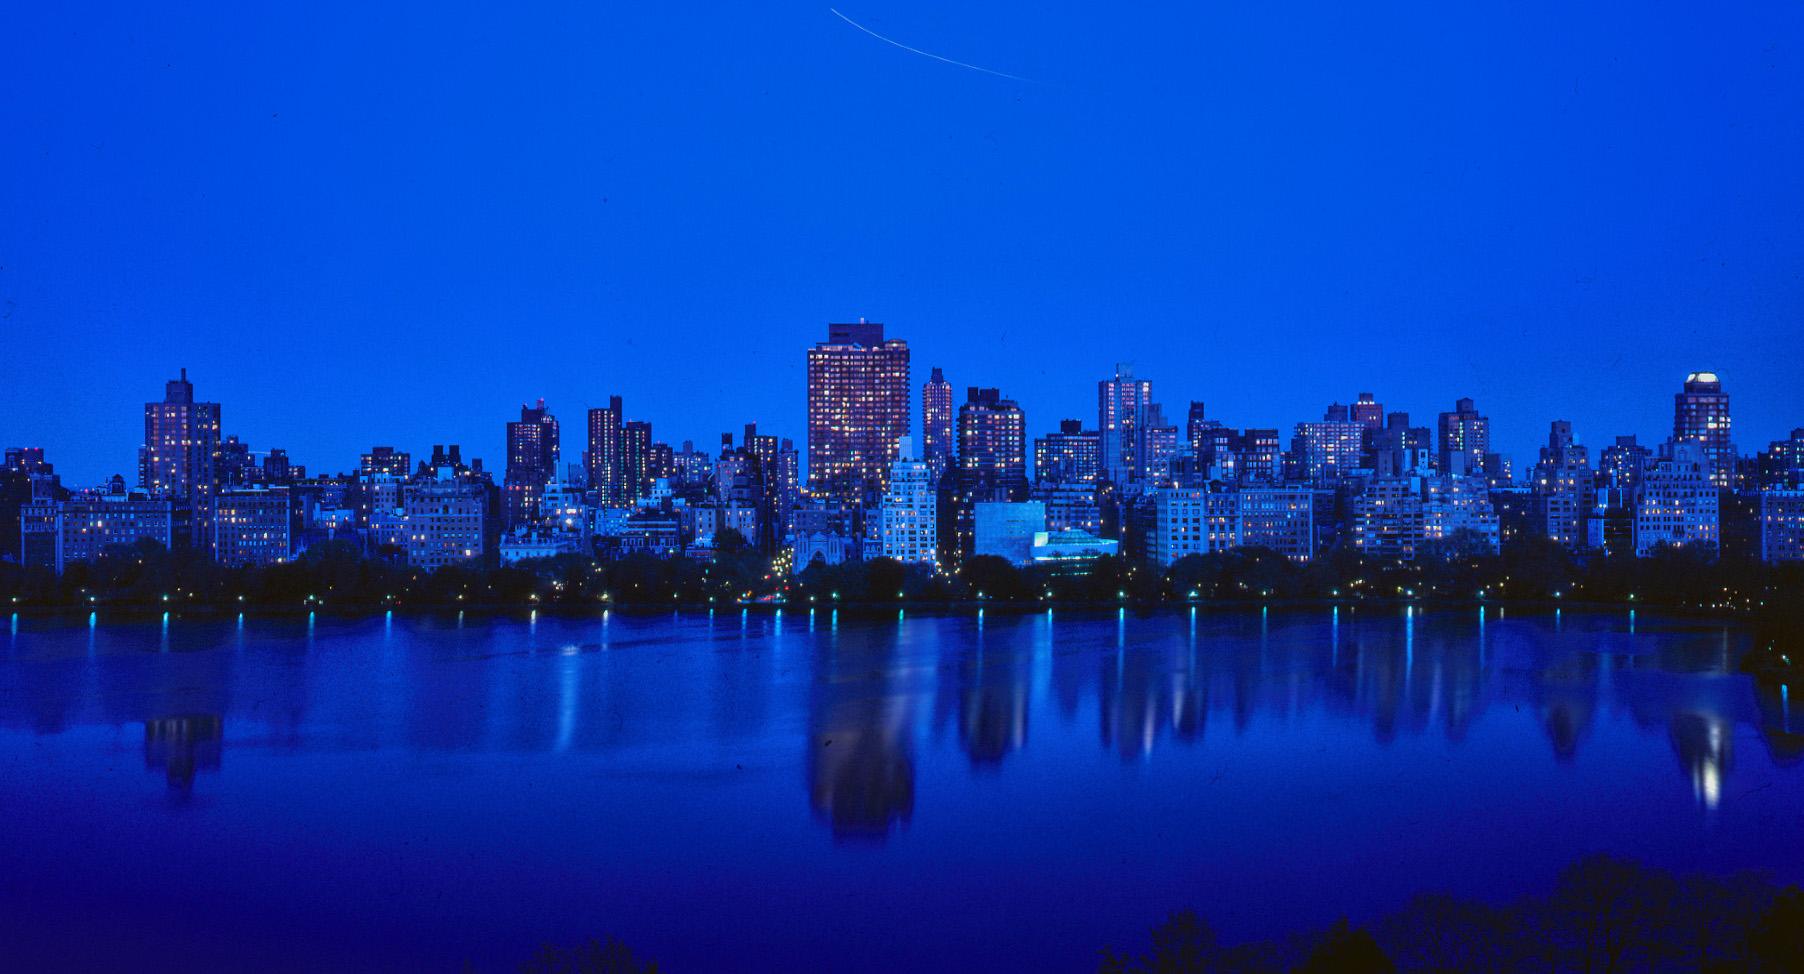 Central Park I - NYC, USA 1998